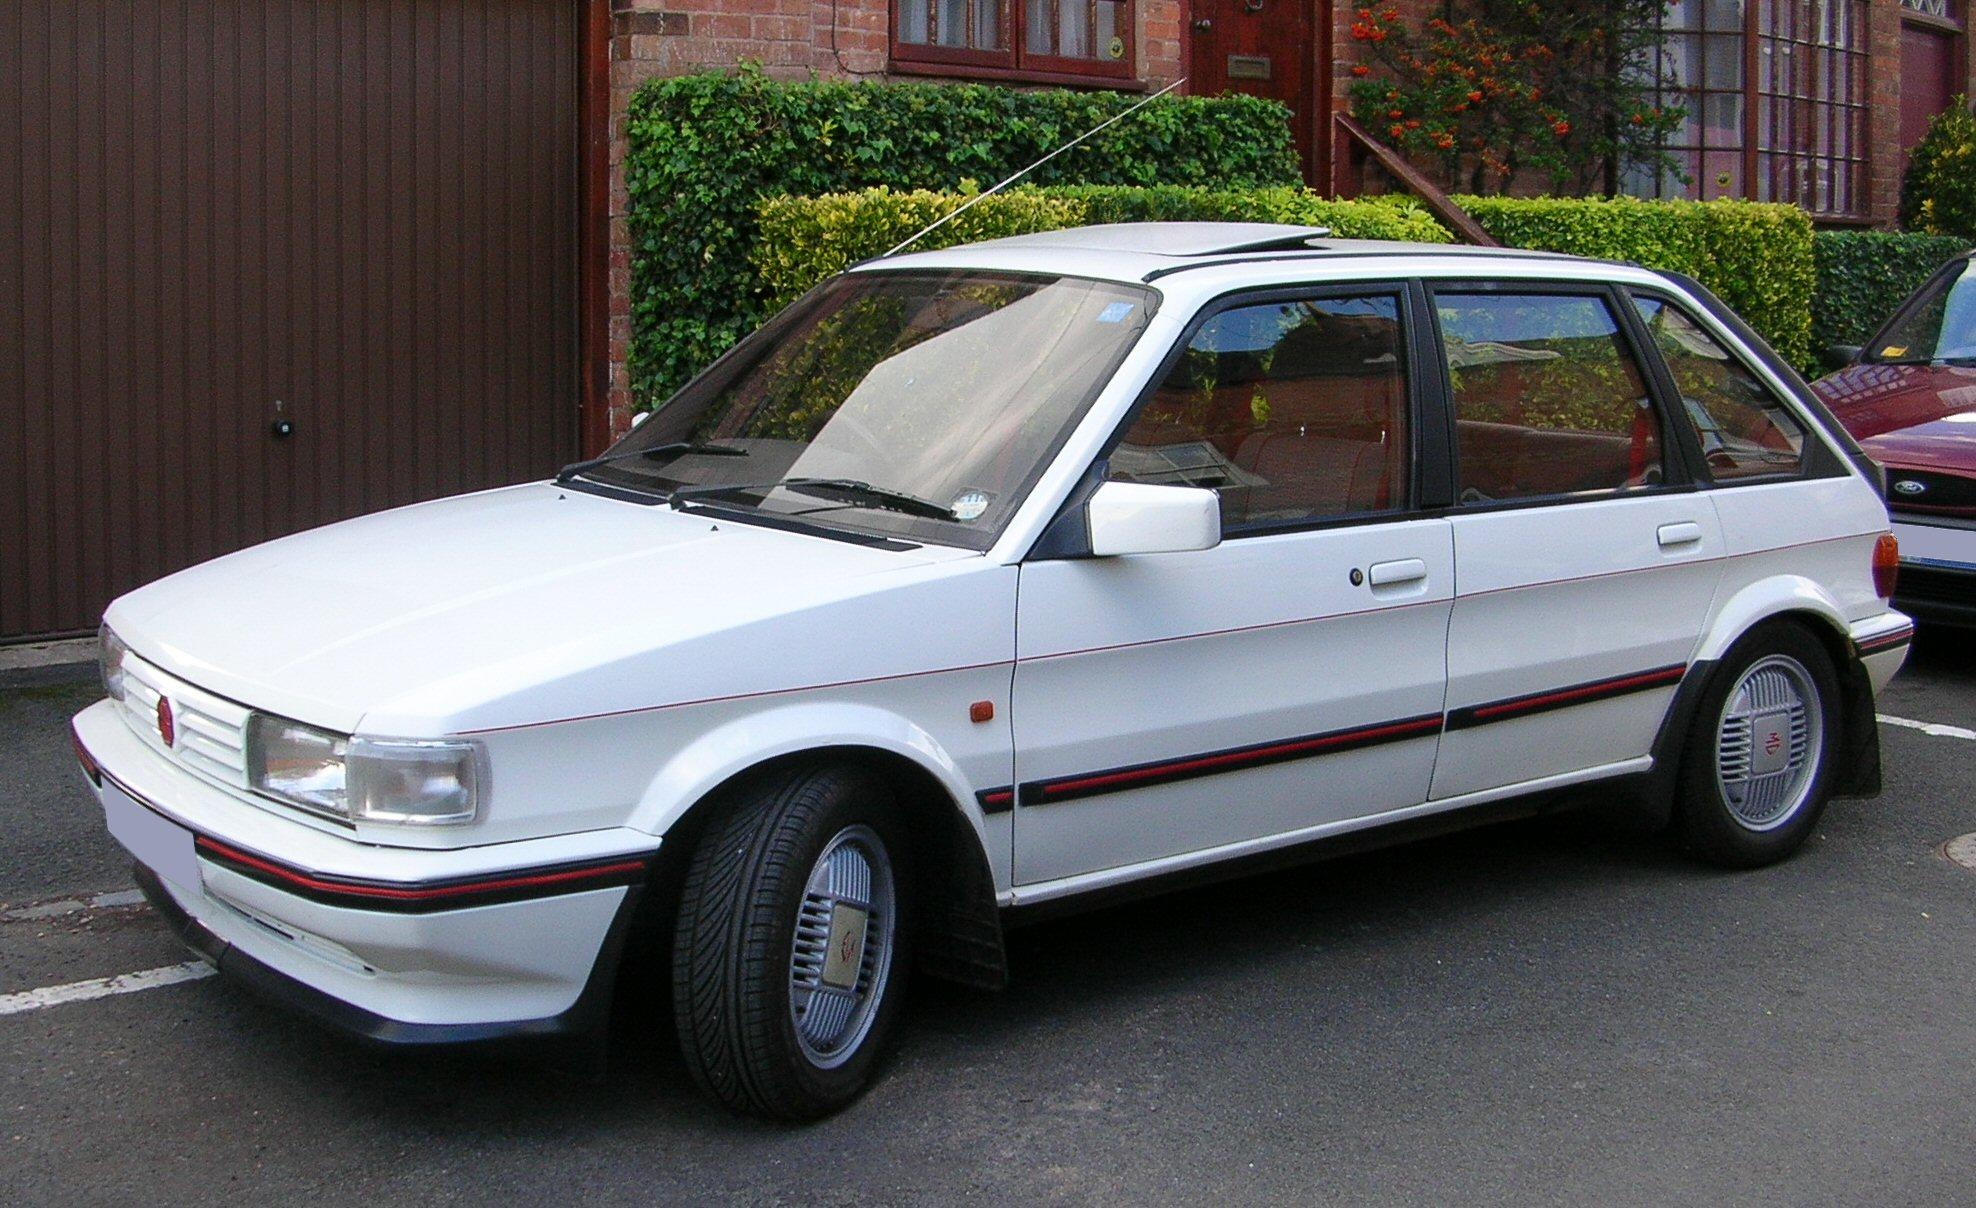 MG Montego 1984 - 1990 Sedan #7